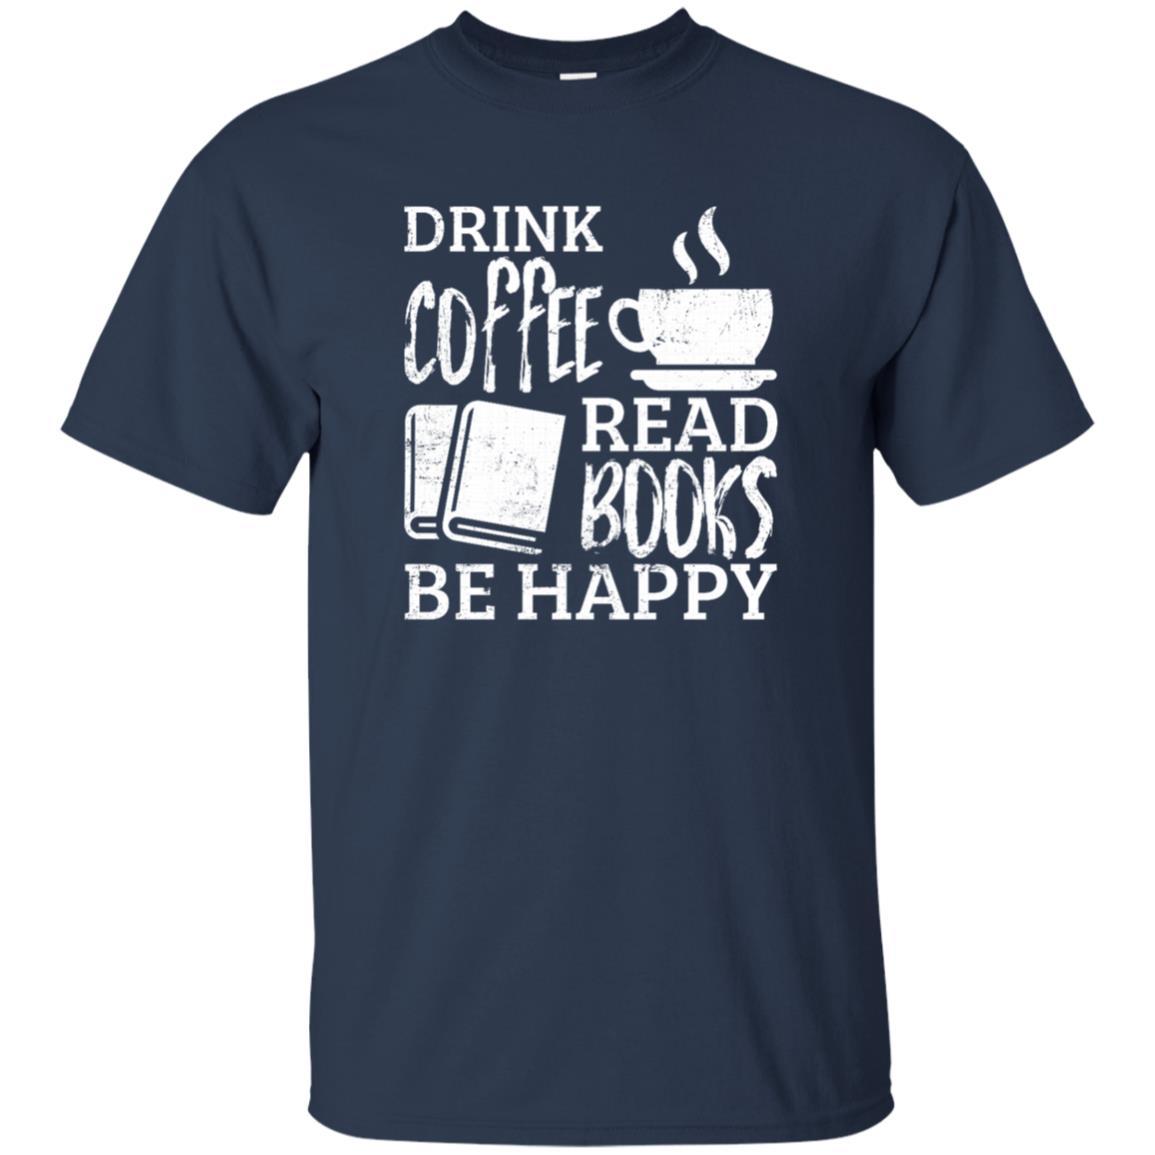 Drink Coffee Read Books Be Happy-1 Unisex Short Sleeve